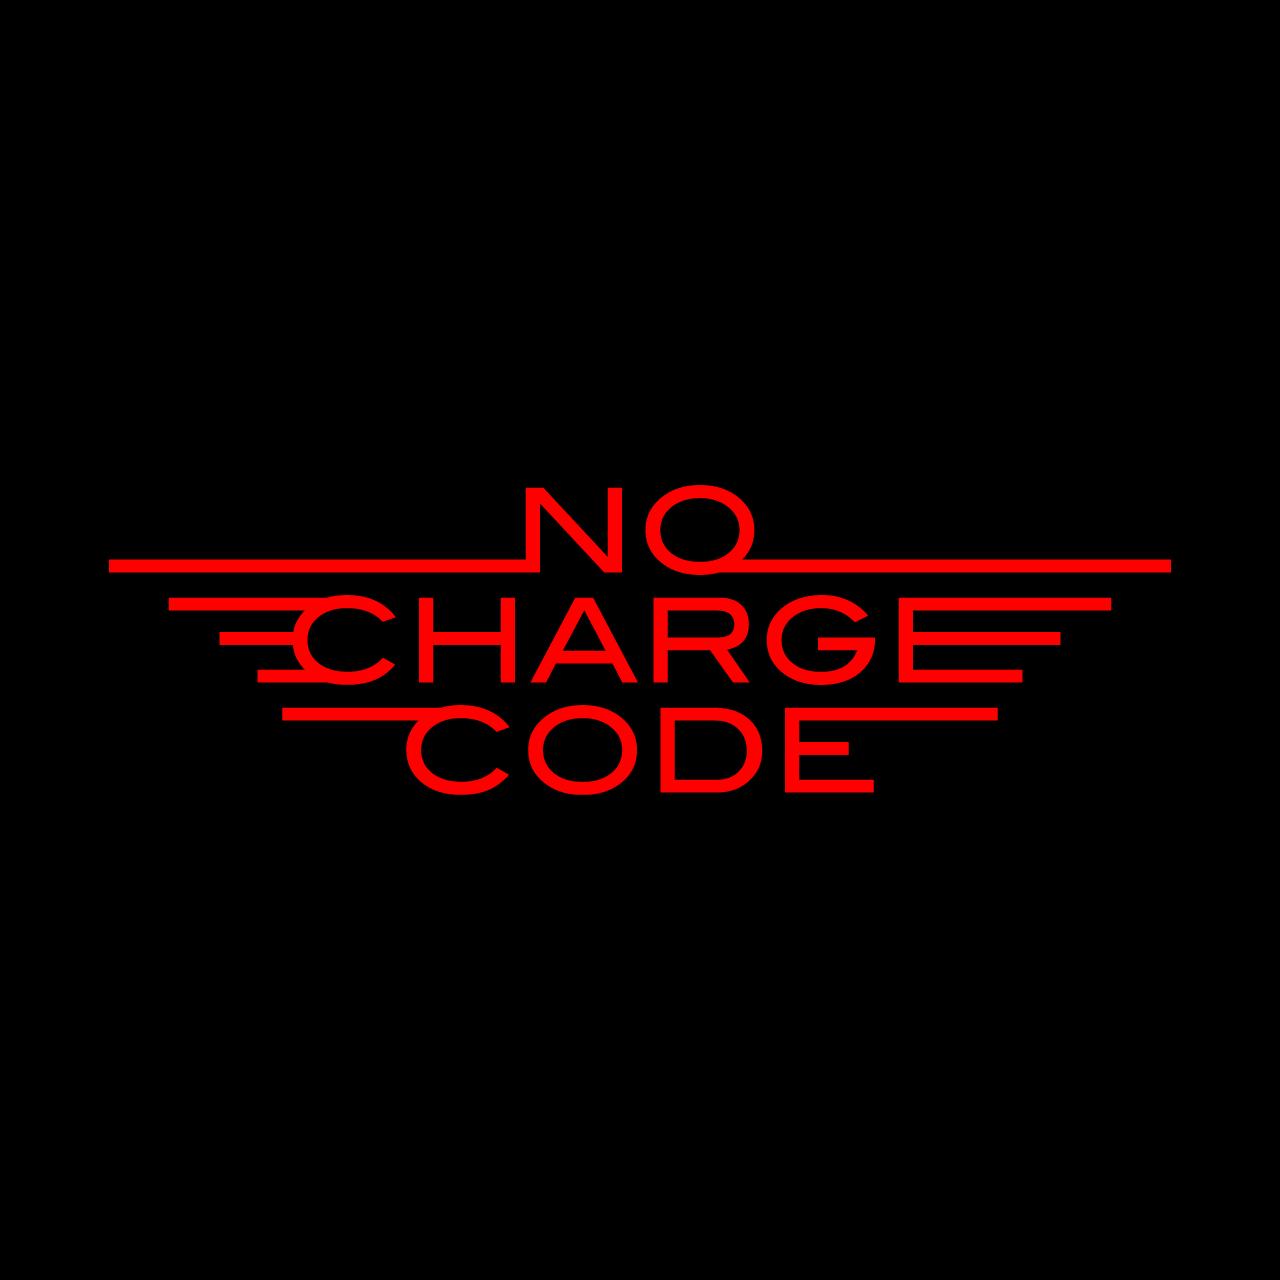 no-charge-code-logo-2